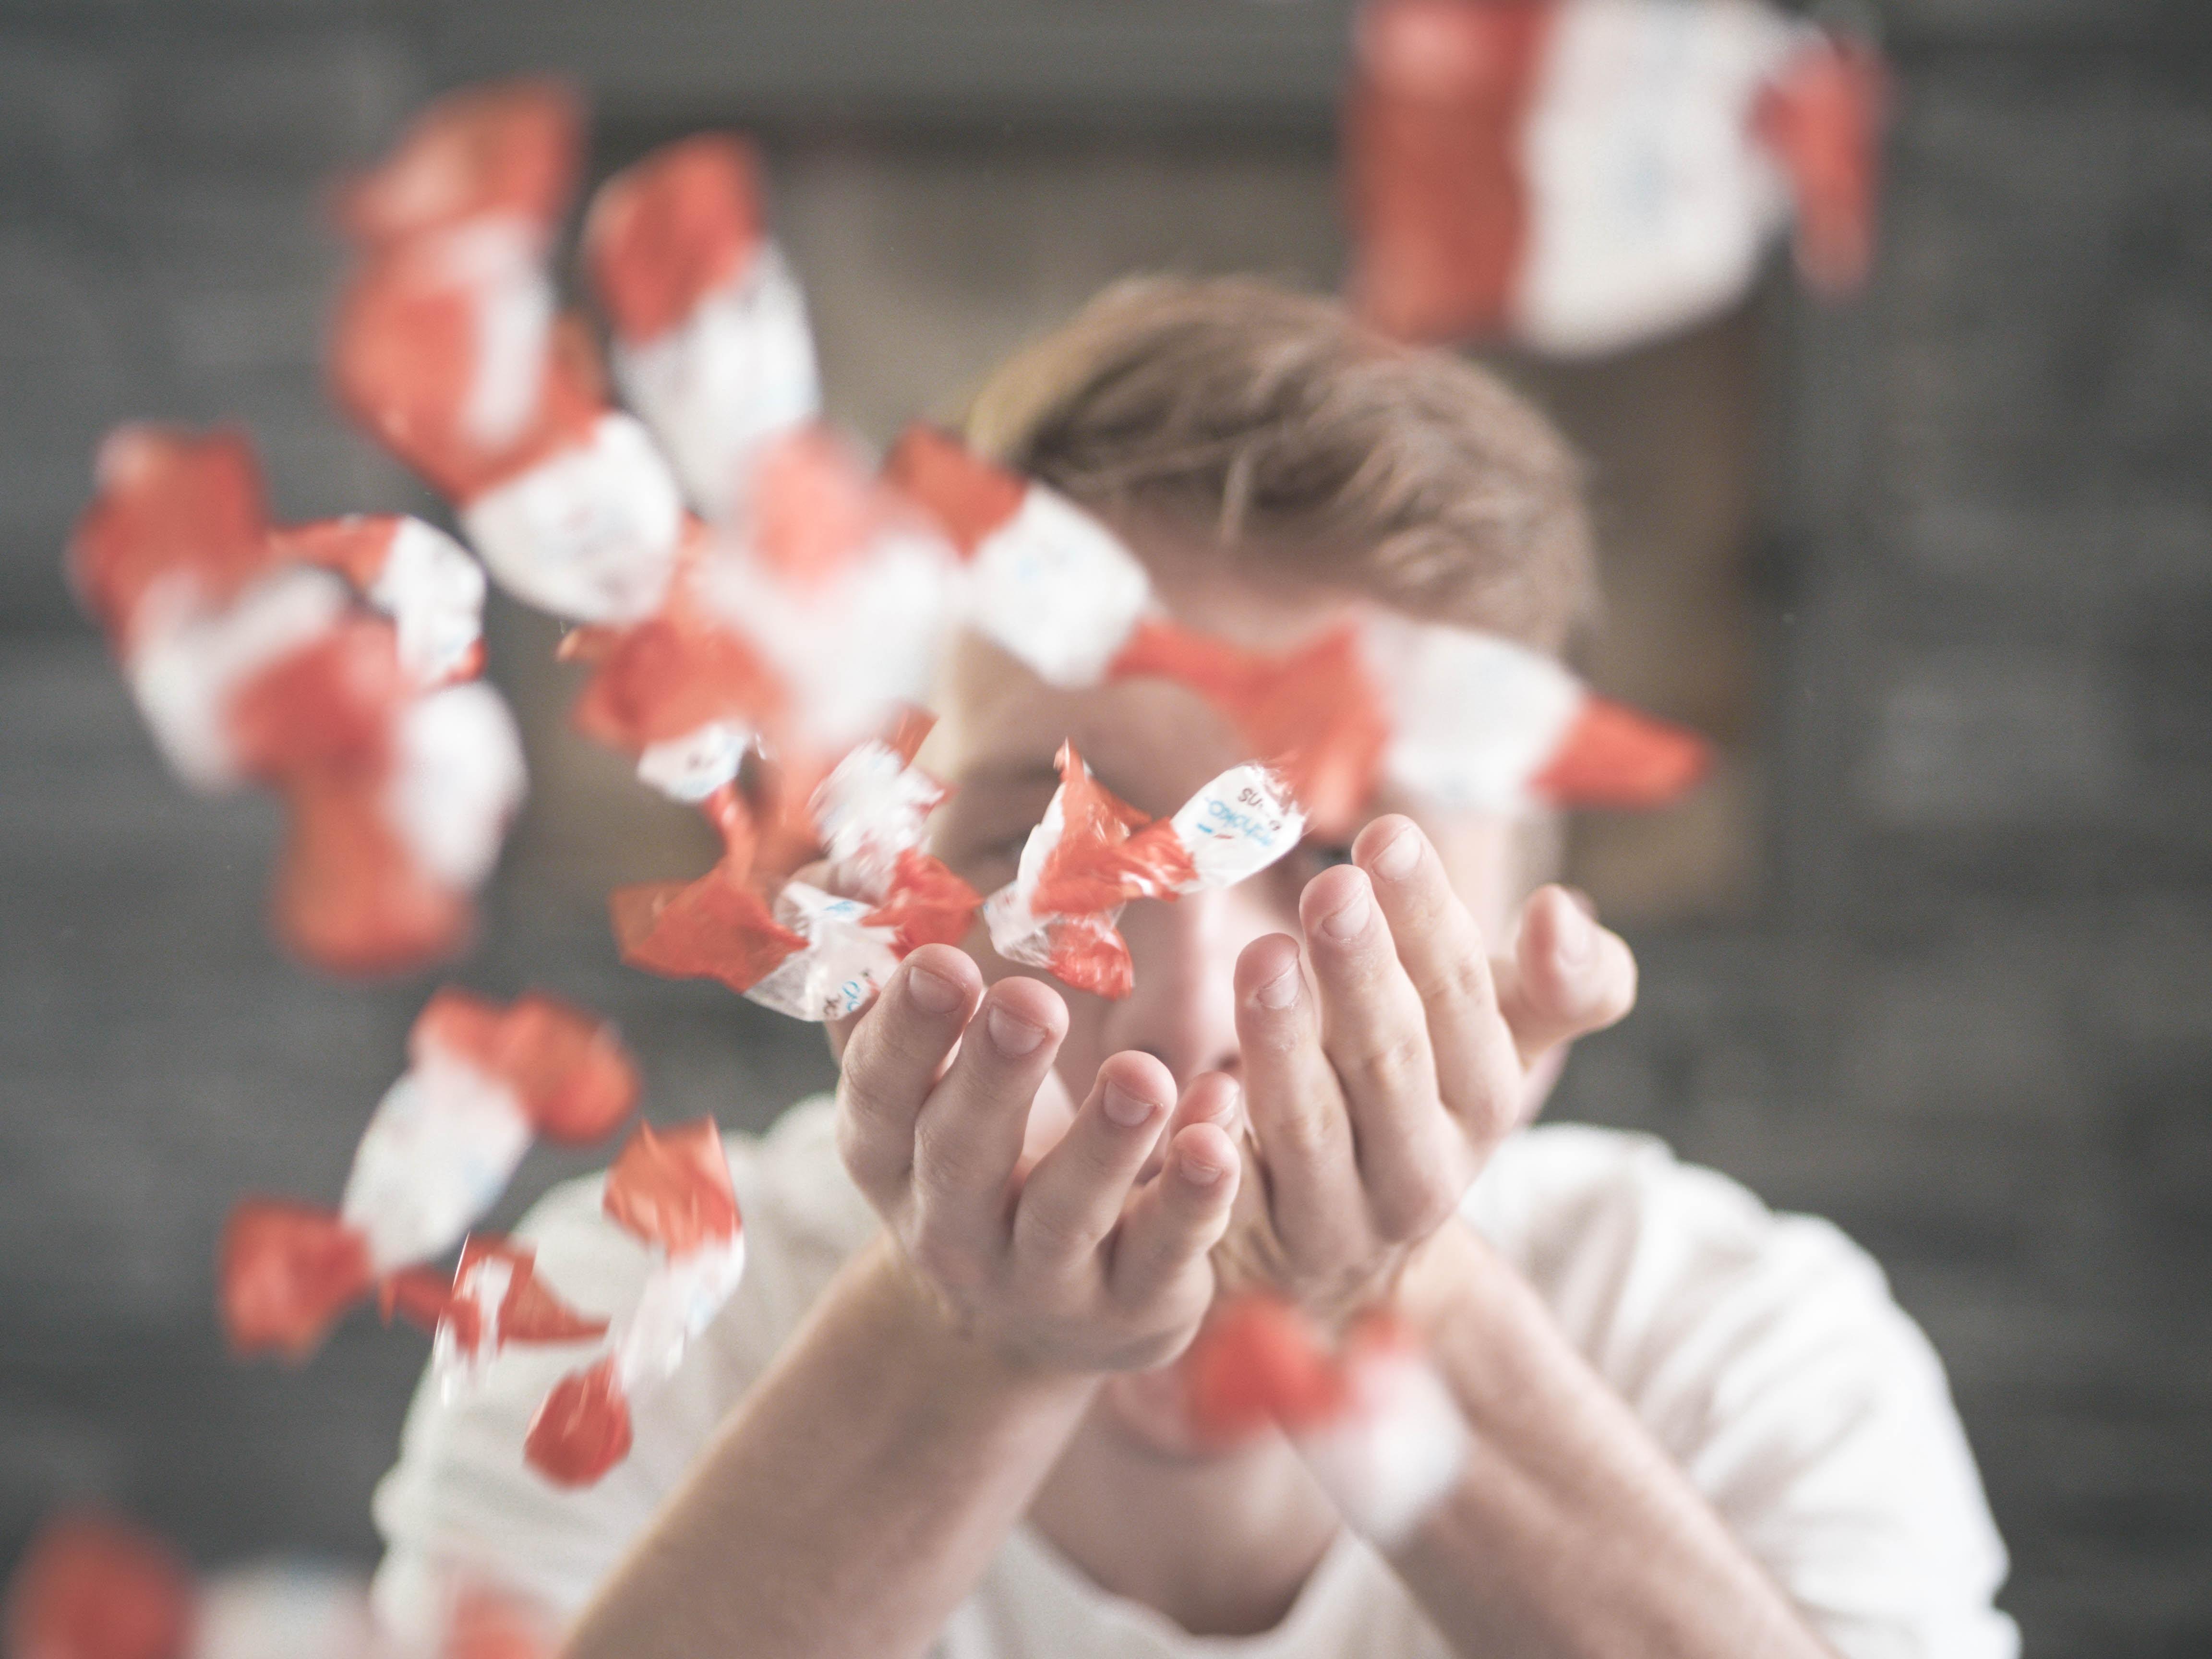 man scattering flower petals